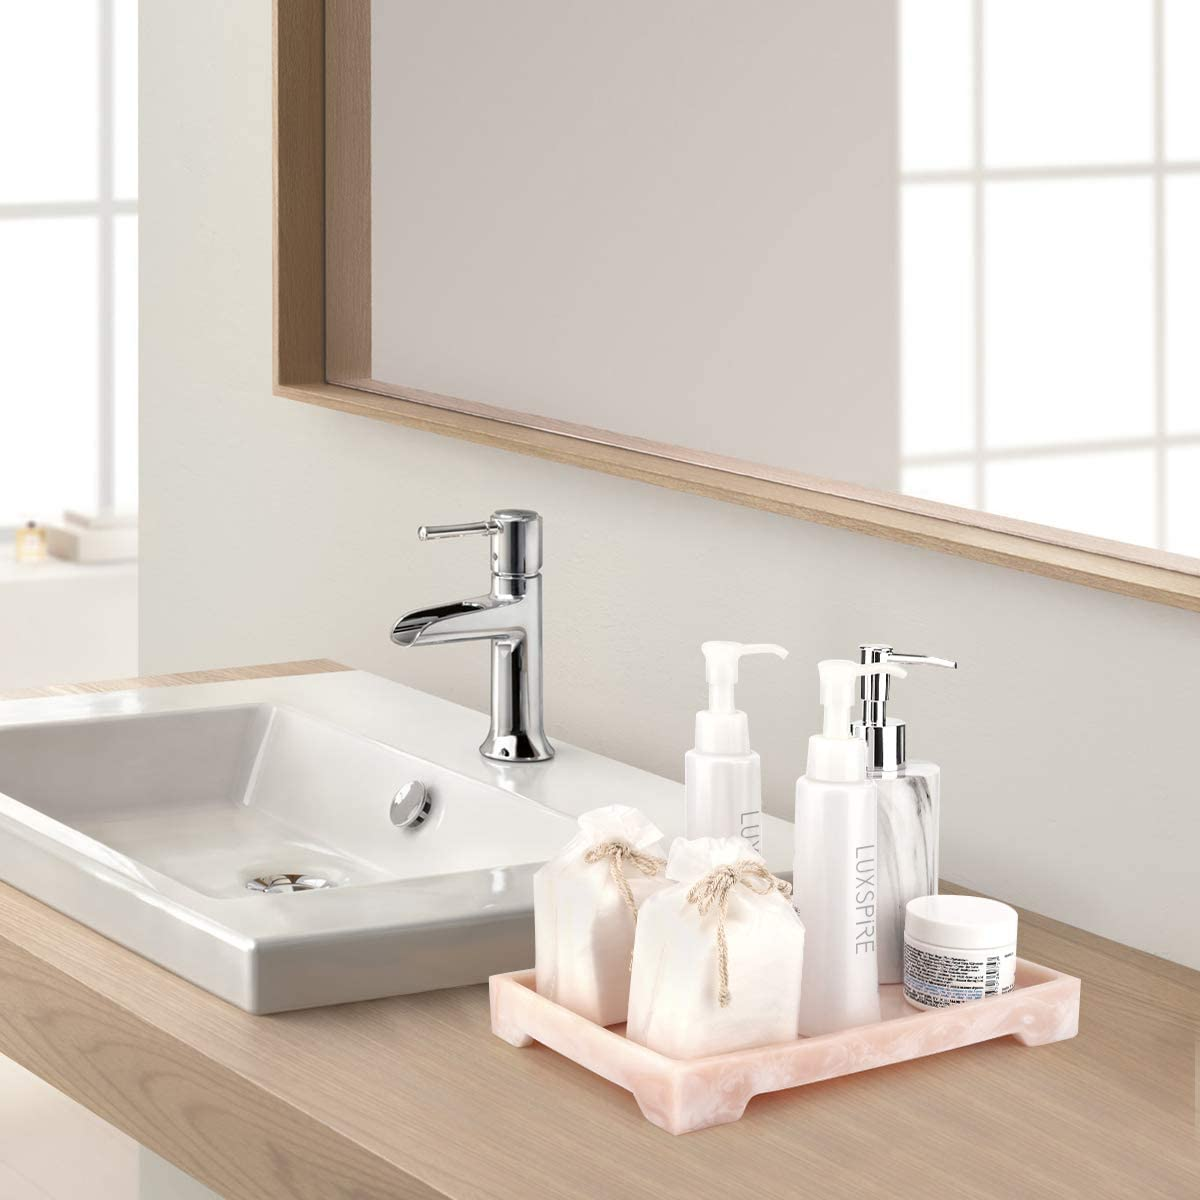 Vanity Organizer for Tissues Toilet Tank Storage Tray etc Soap Candles Luxspire Vanity Tray Towel Plant Pink Resin Bathtub Tray Bathroom Tray Marble Pattern Tray